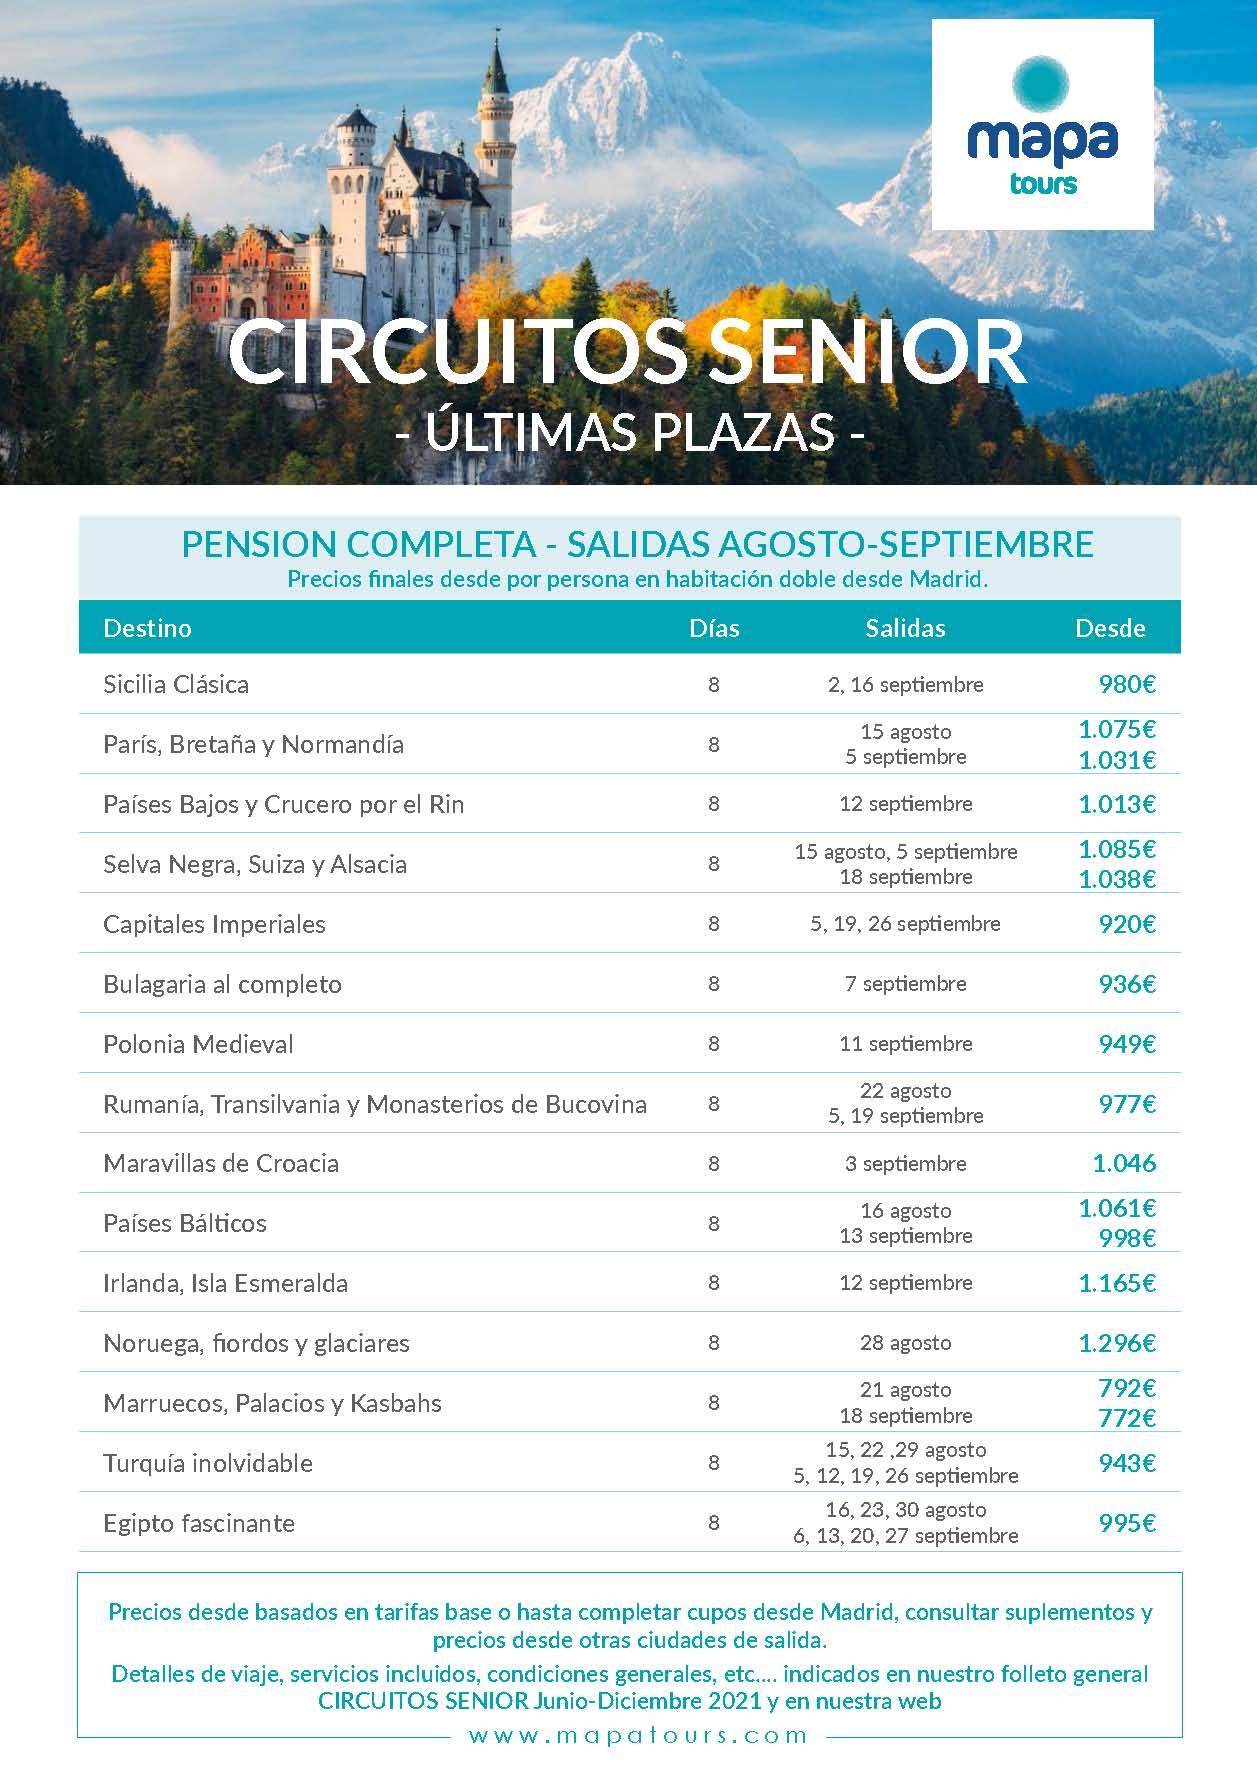 Ofertas Mapa Tours Senior Ultimas Plazas Agosto y Septiembre 2021